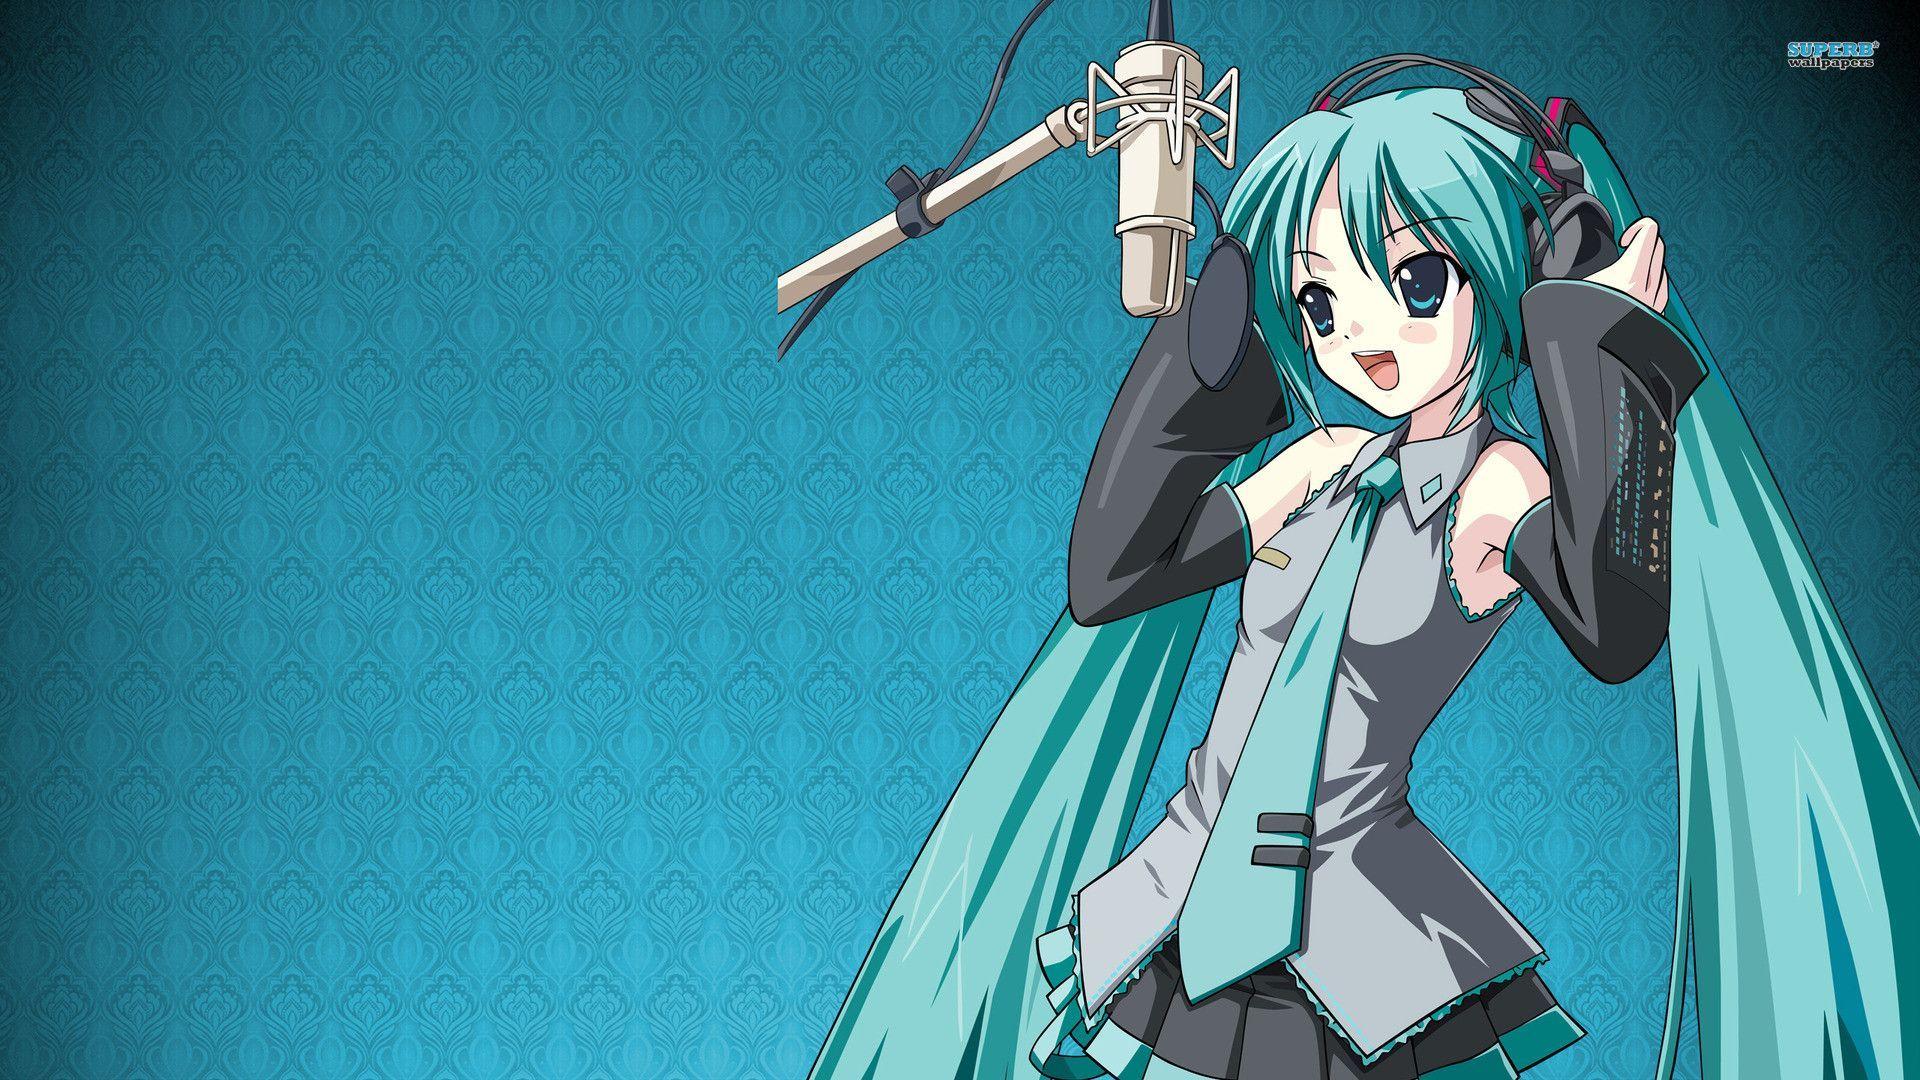 Full-HD-p-Hatsune-miku-HD-Desktop-Backgrounds-wallpaper-wp3606001